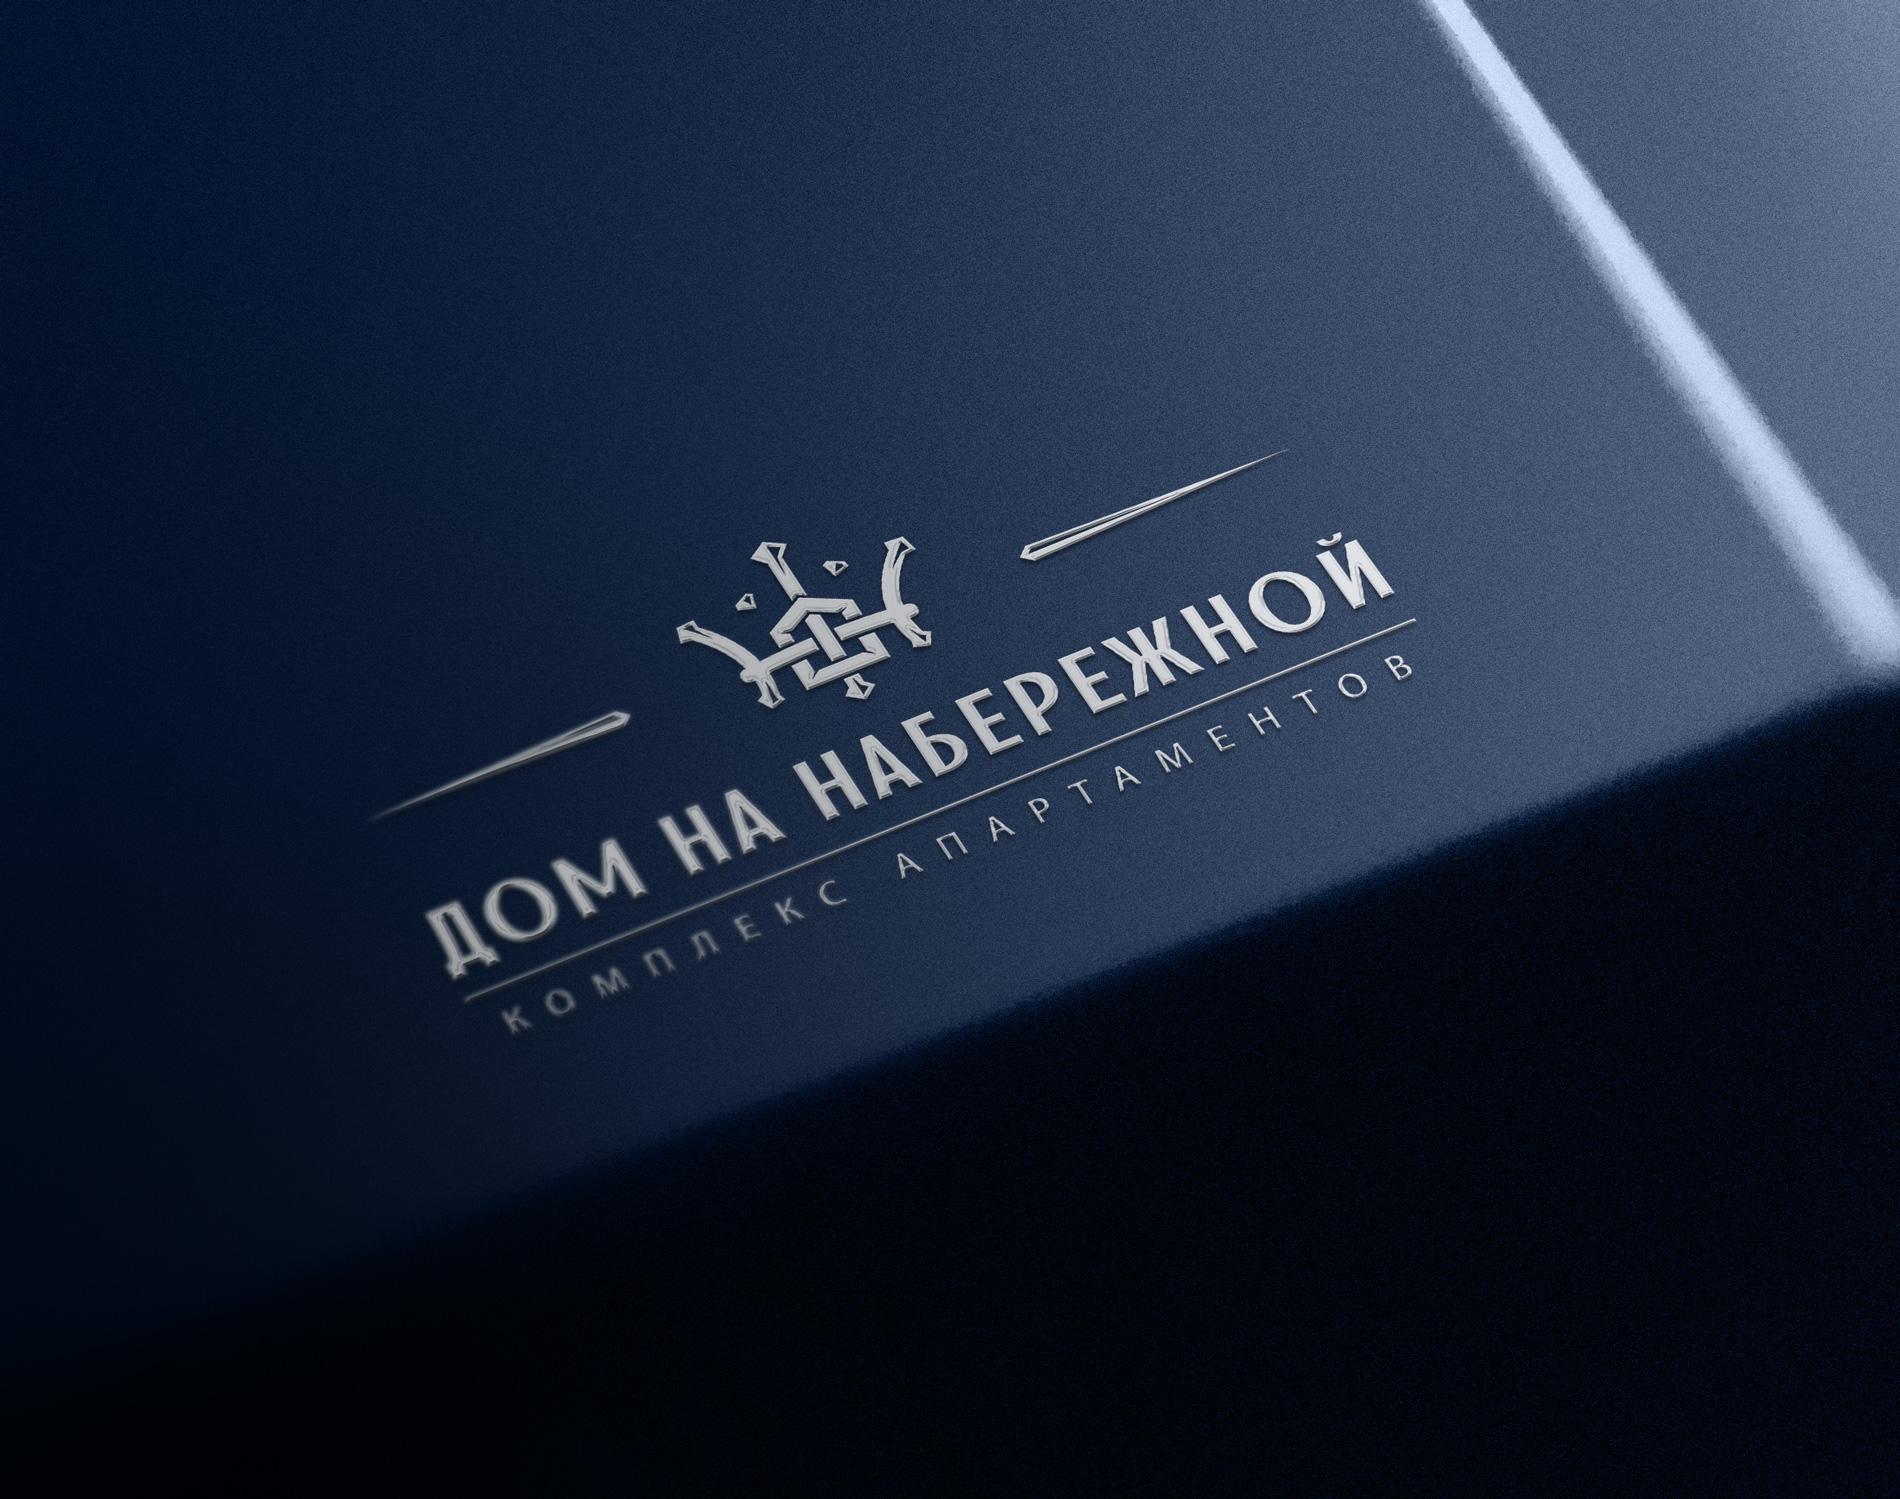 РАЗРАБОТКА логотипа для ЖИЛОГО КОМПЛЕКСА премиум В АНАПЕ.  фото f_0415dea94c158d85.jpg